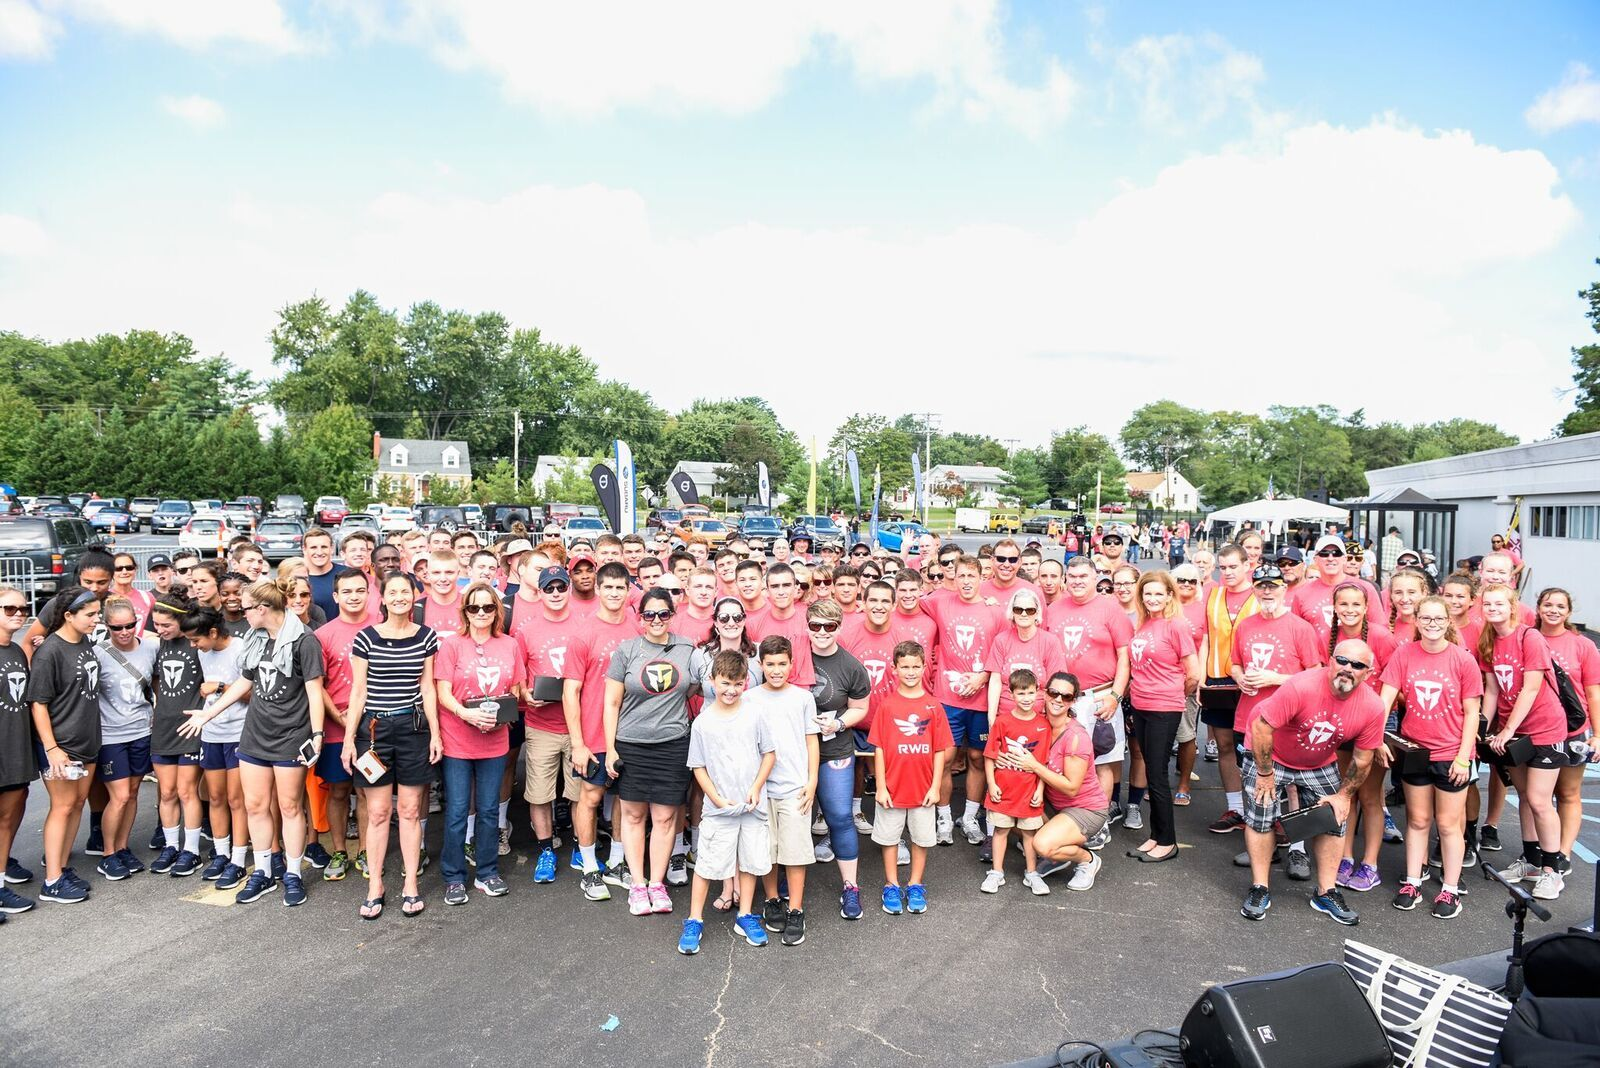 Members of the Annapolis 9/11 Heroes Run Volunteer Brigade in 2017. (Courtesy Megan Evans Photography)